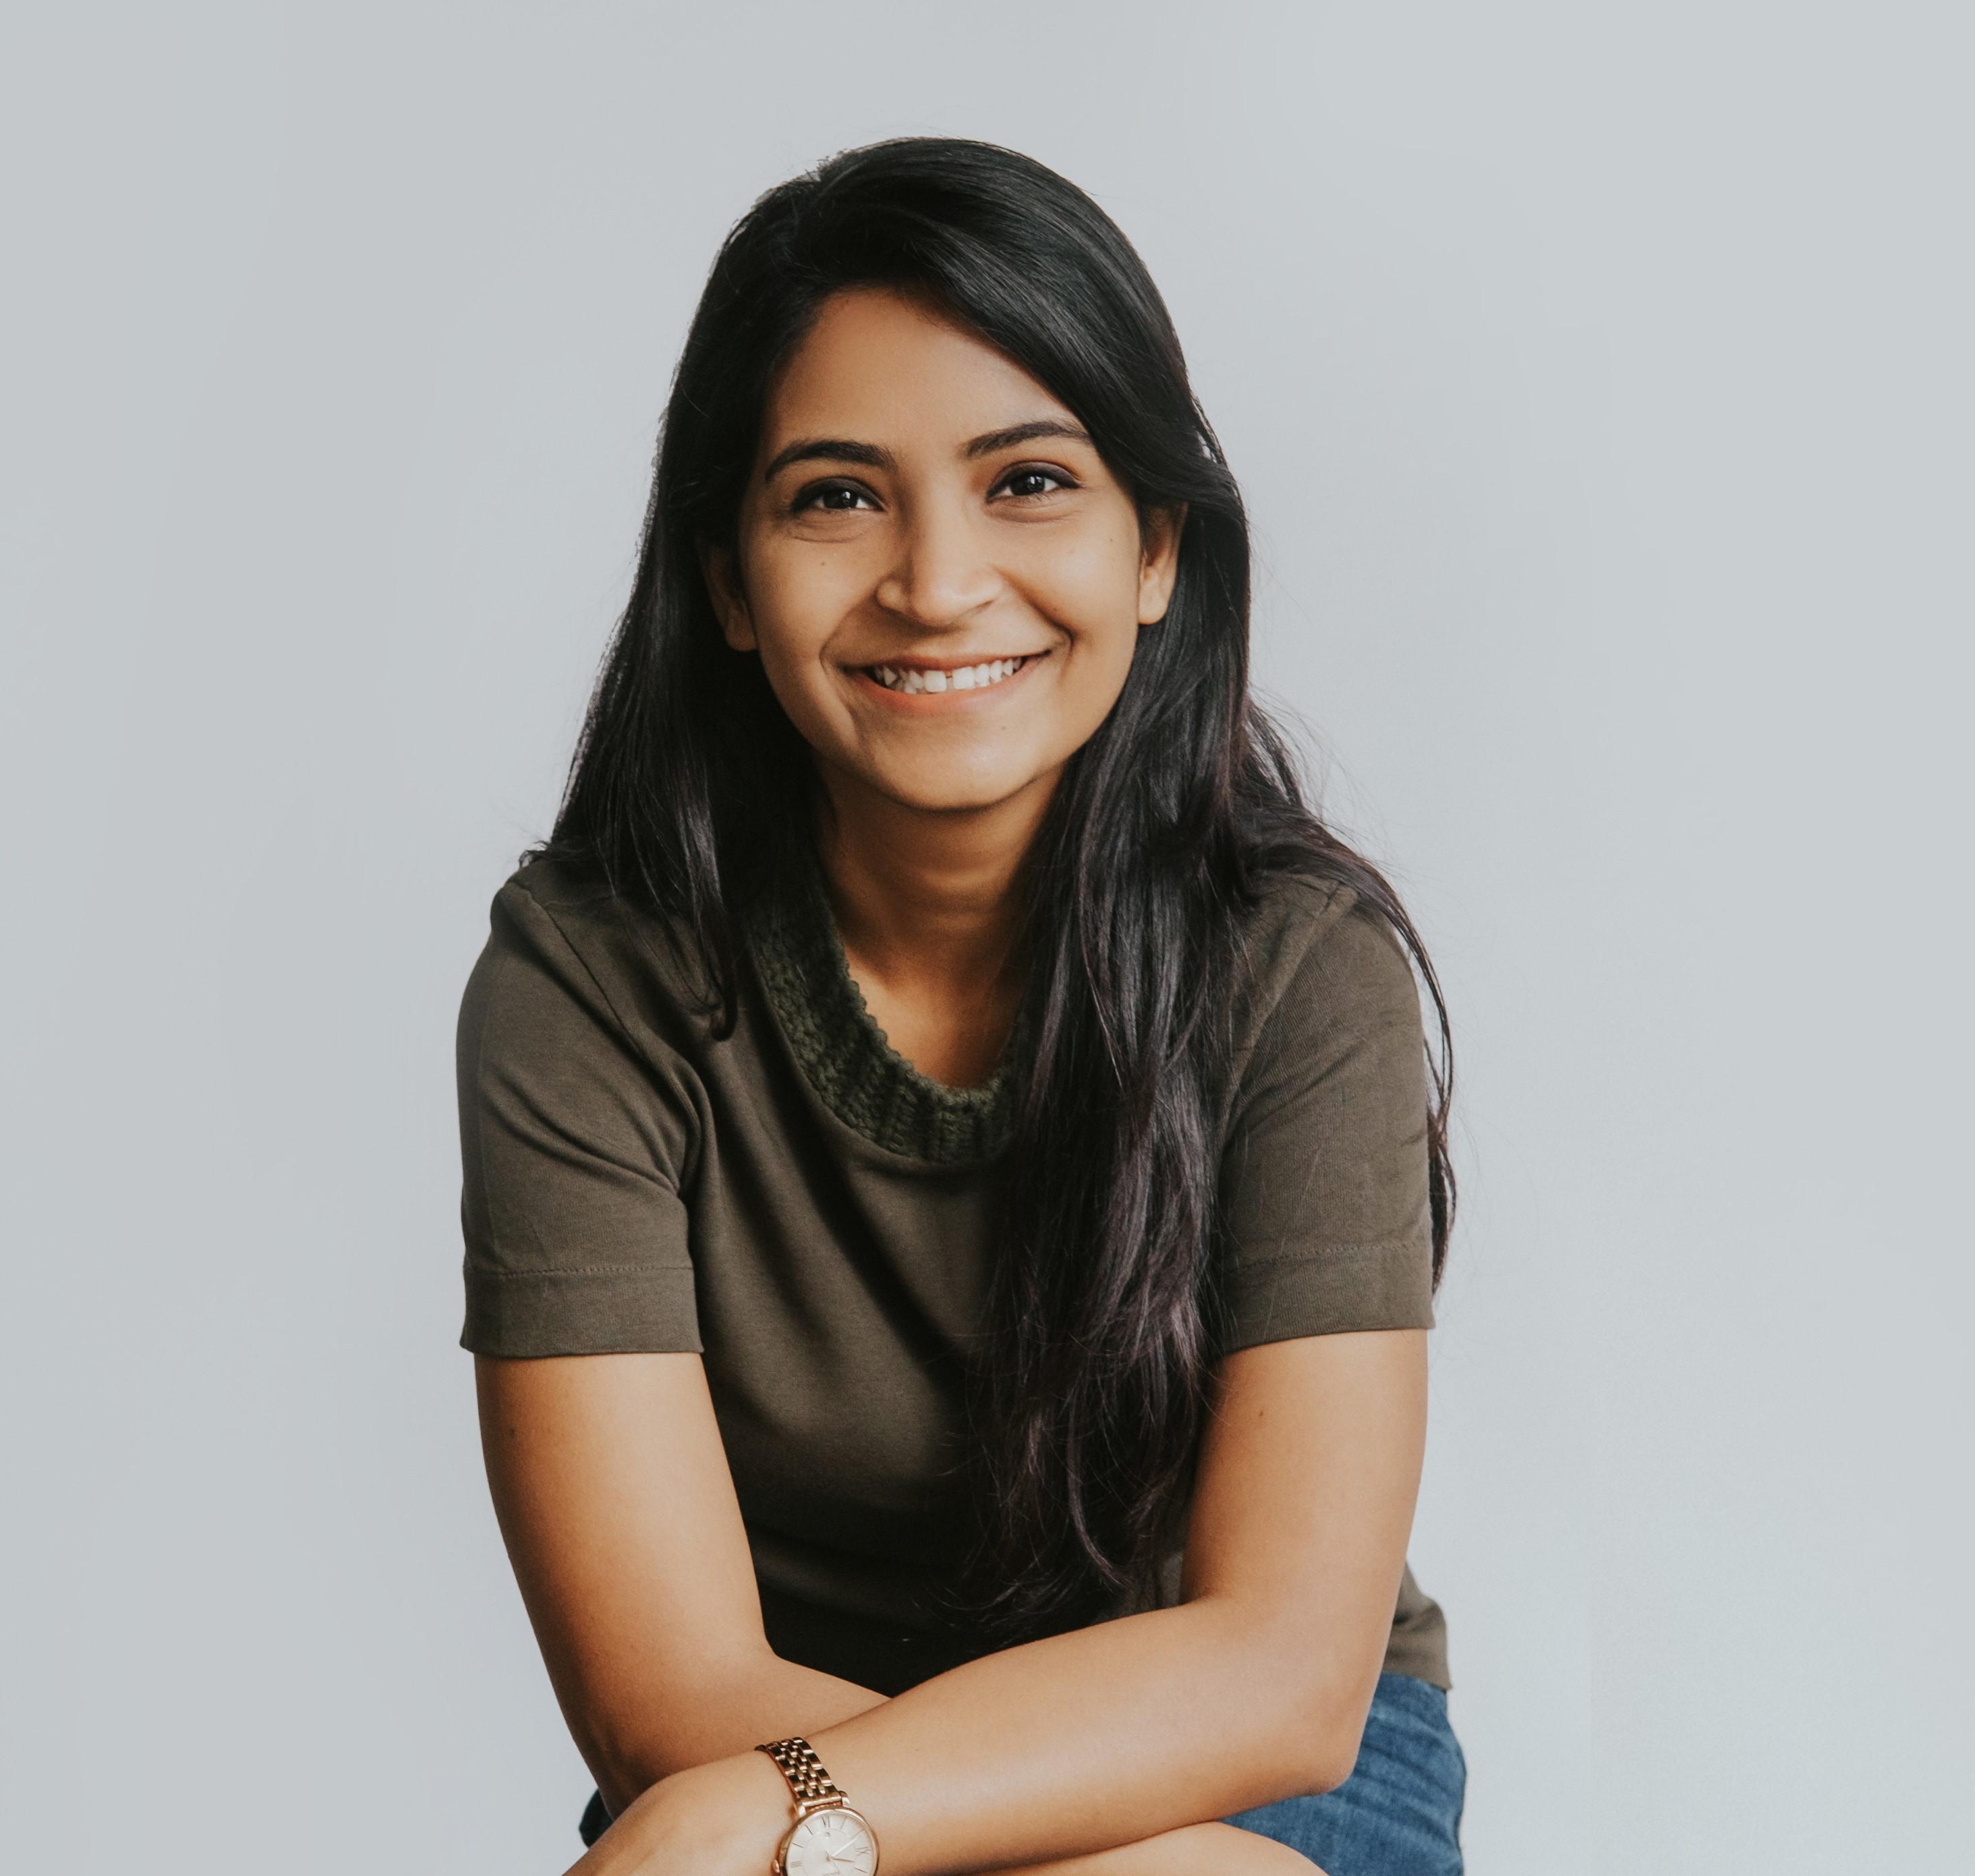 Photo of Aishwarya Tiwari